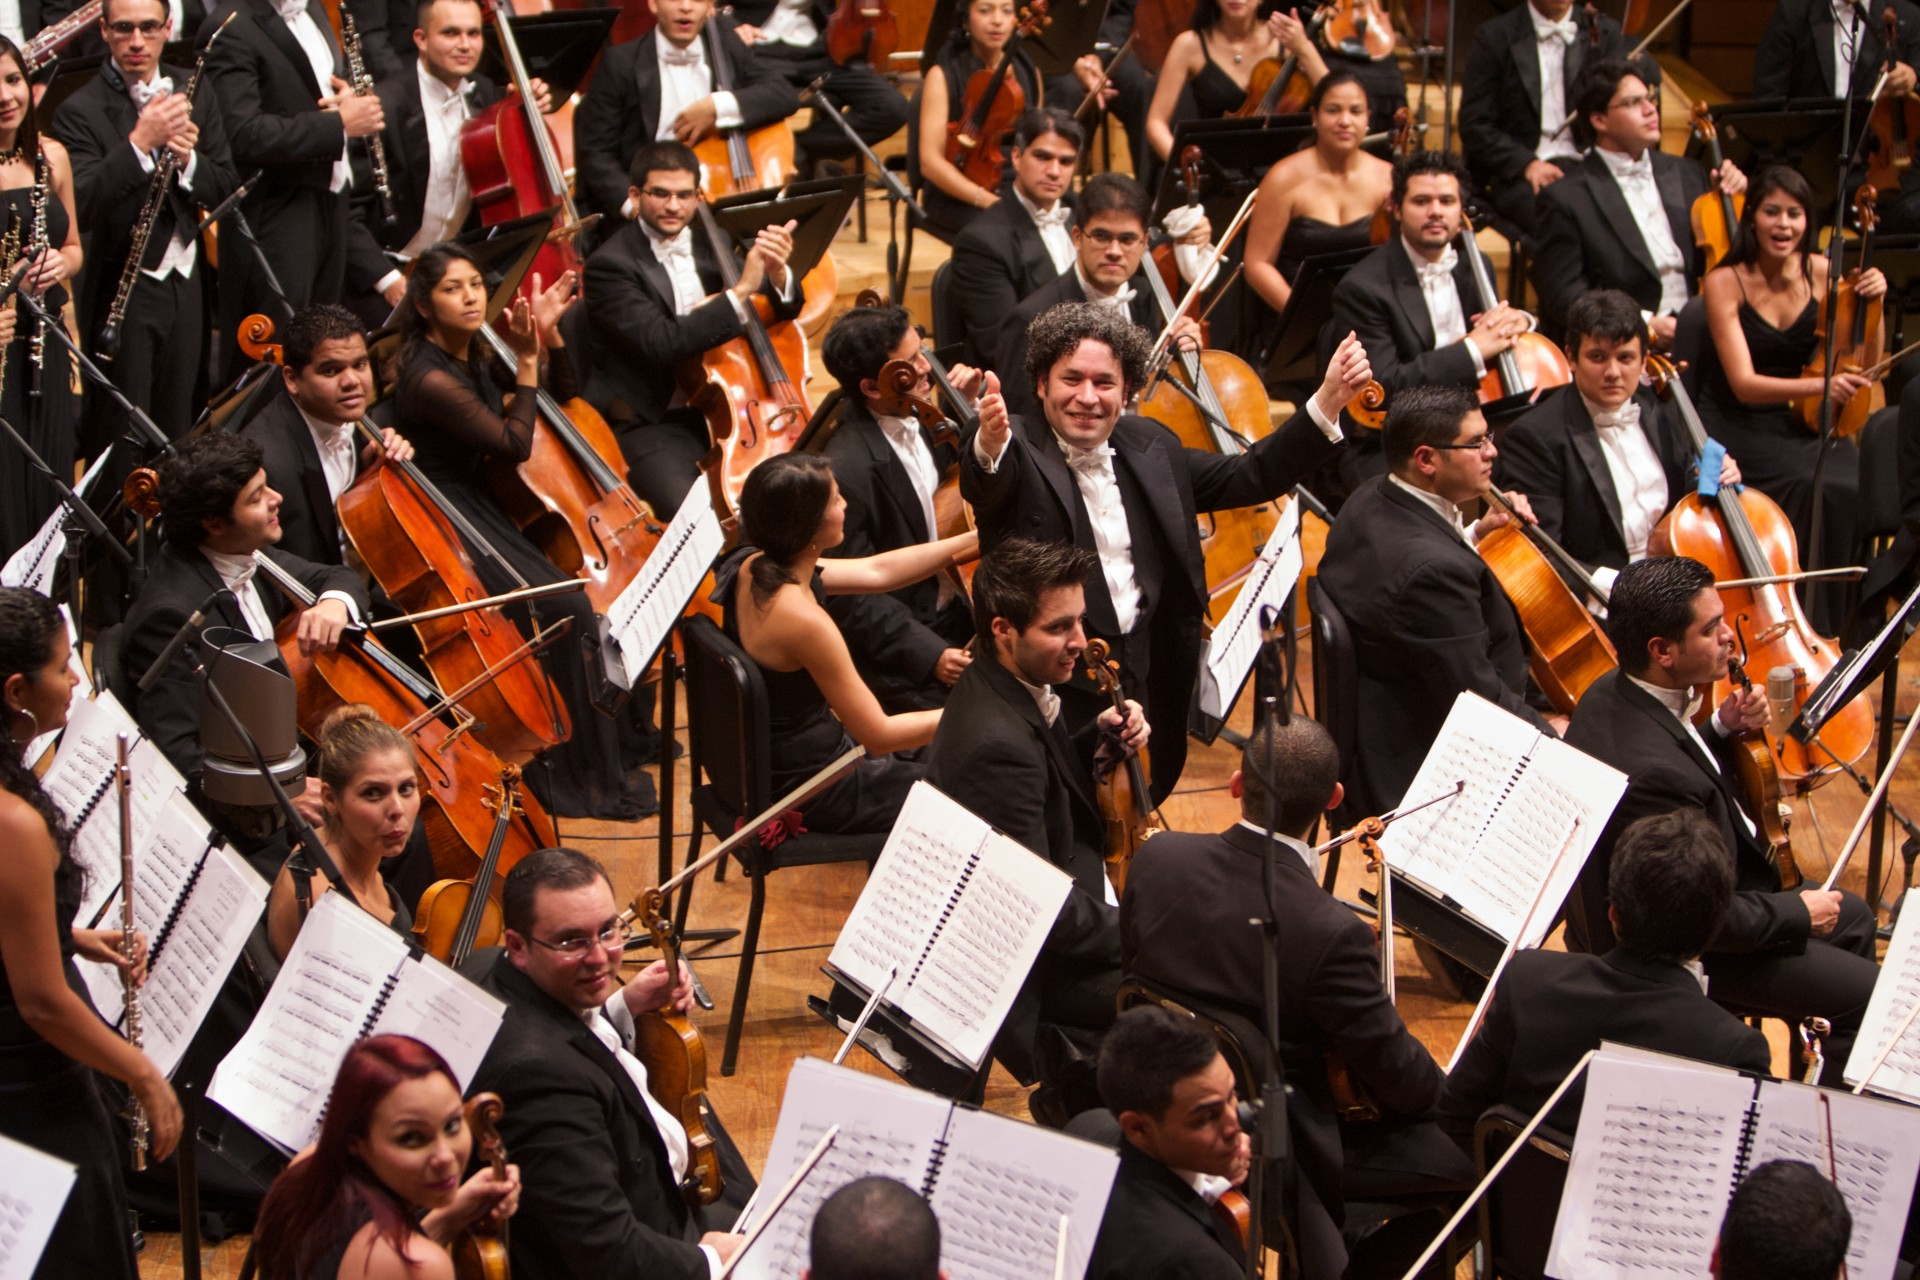 NOHE1500 OSSB B Gustavo Dudamel 2014-10-24